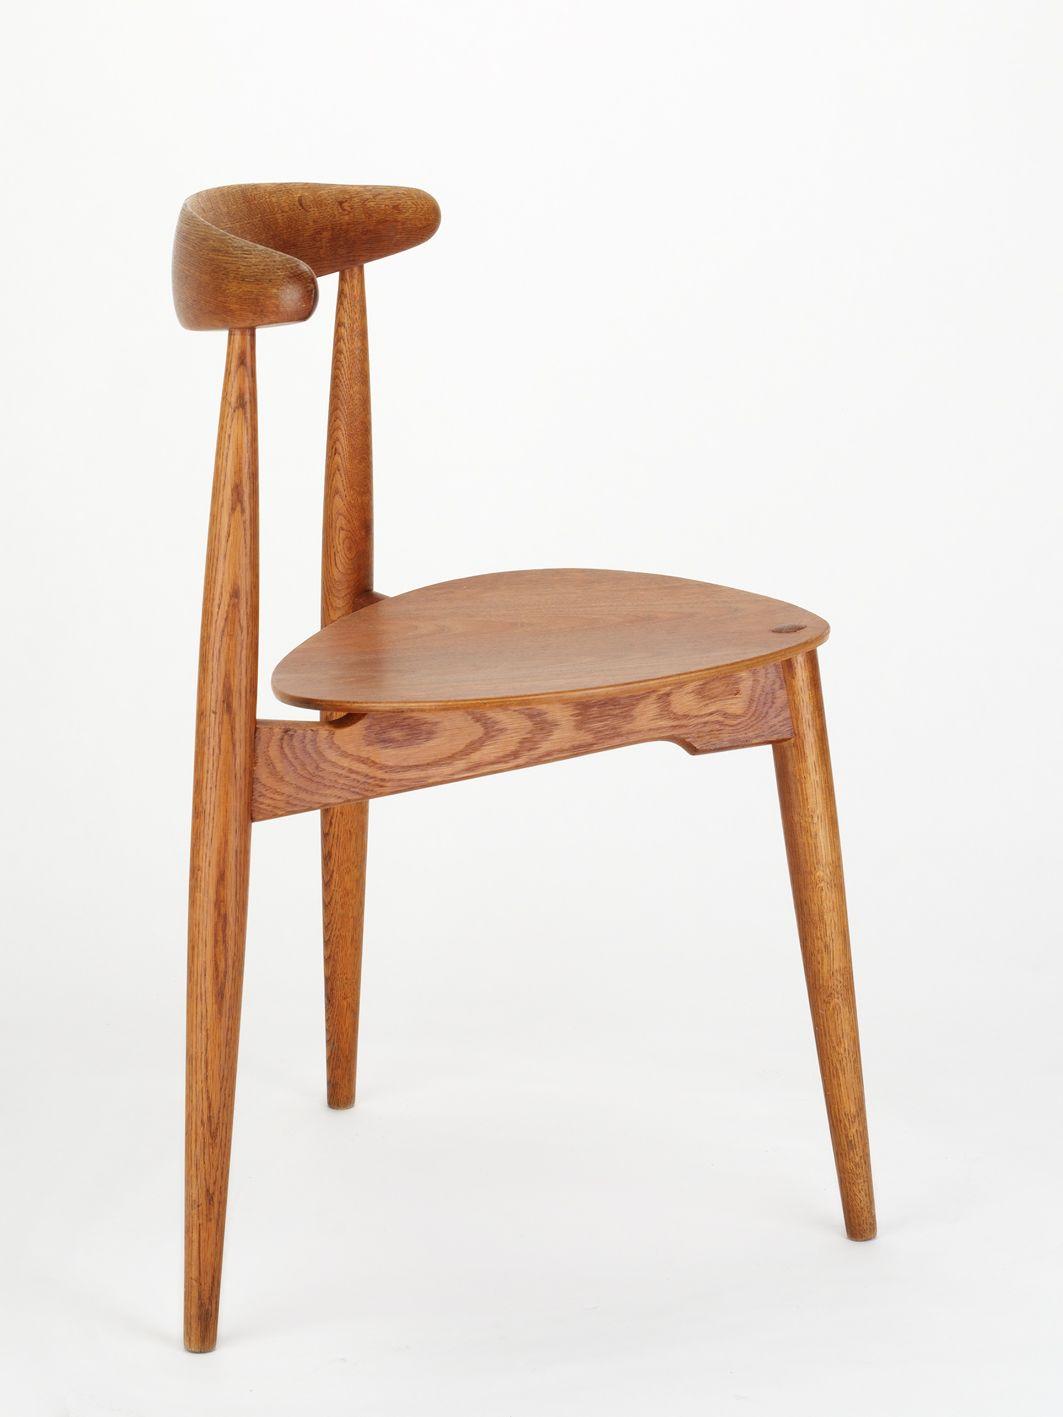 Hans J. Wegner, Hearth Chair Stuhl Nr.41031952